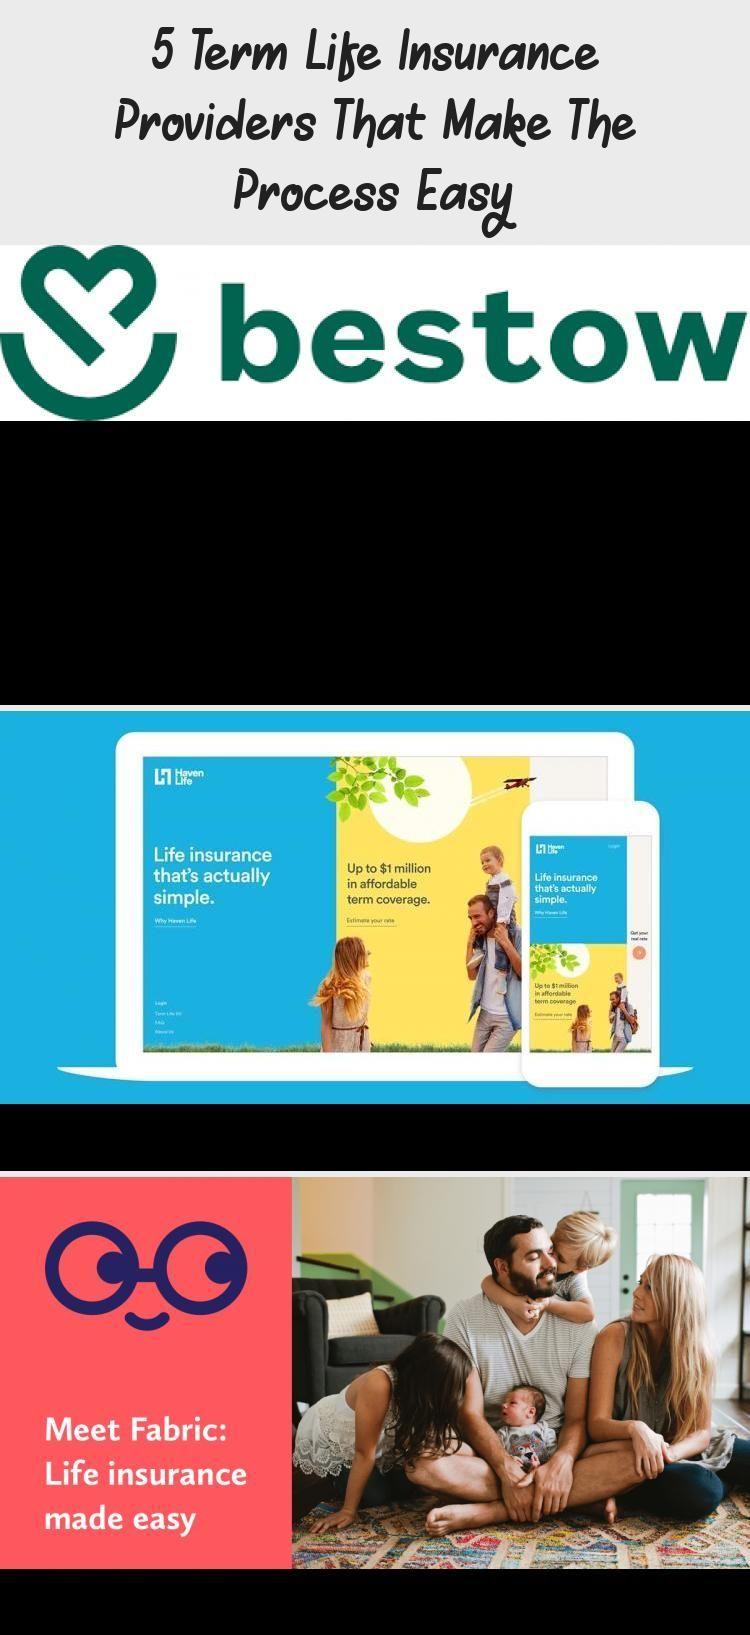 Buying Life Insurance? These 5 companies make buying life